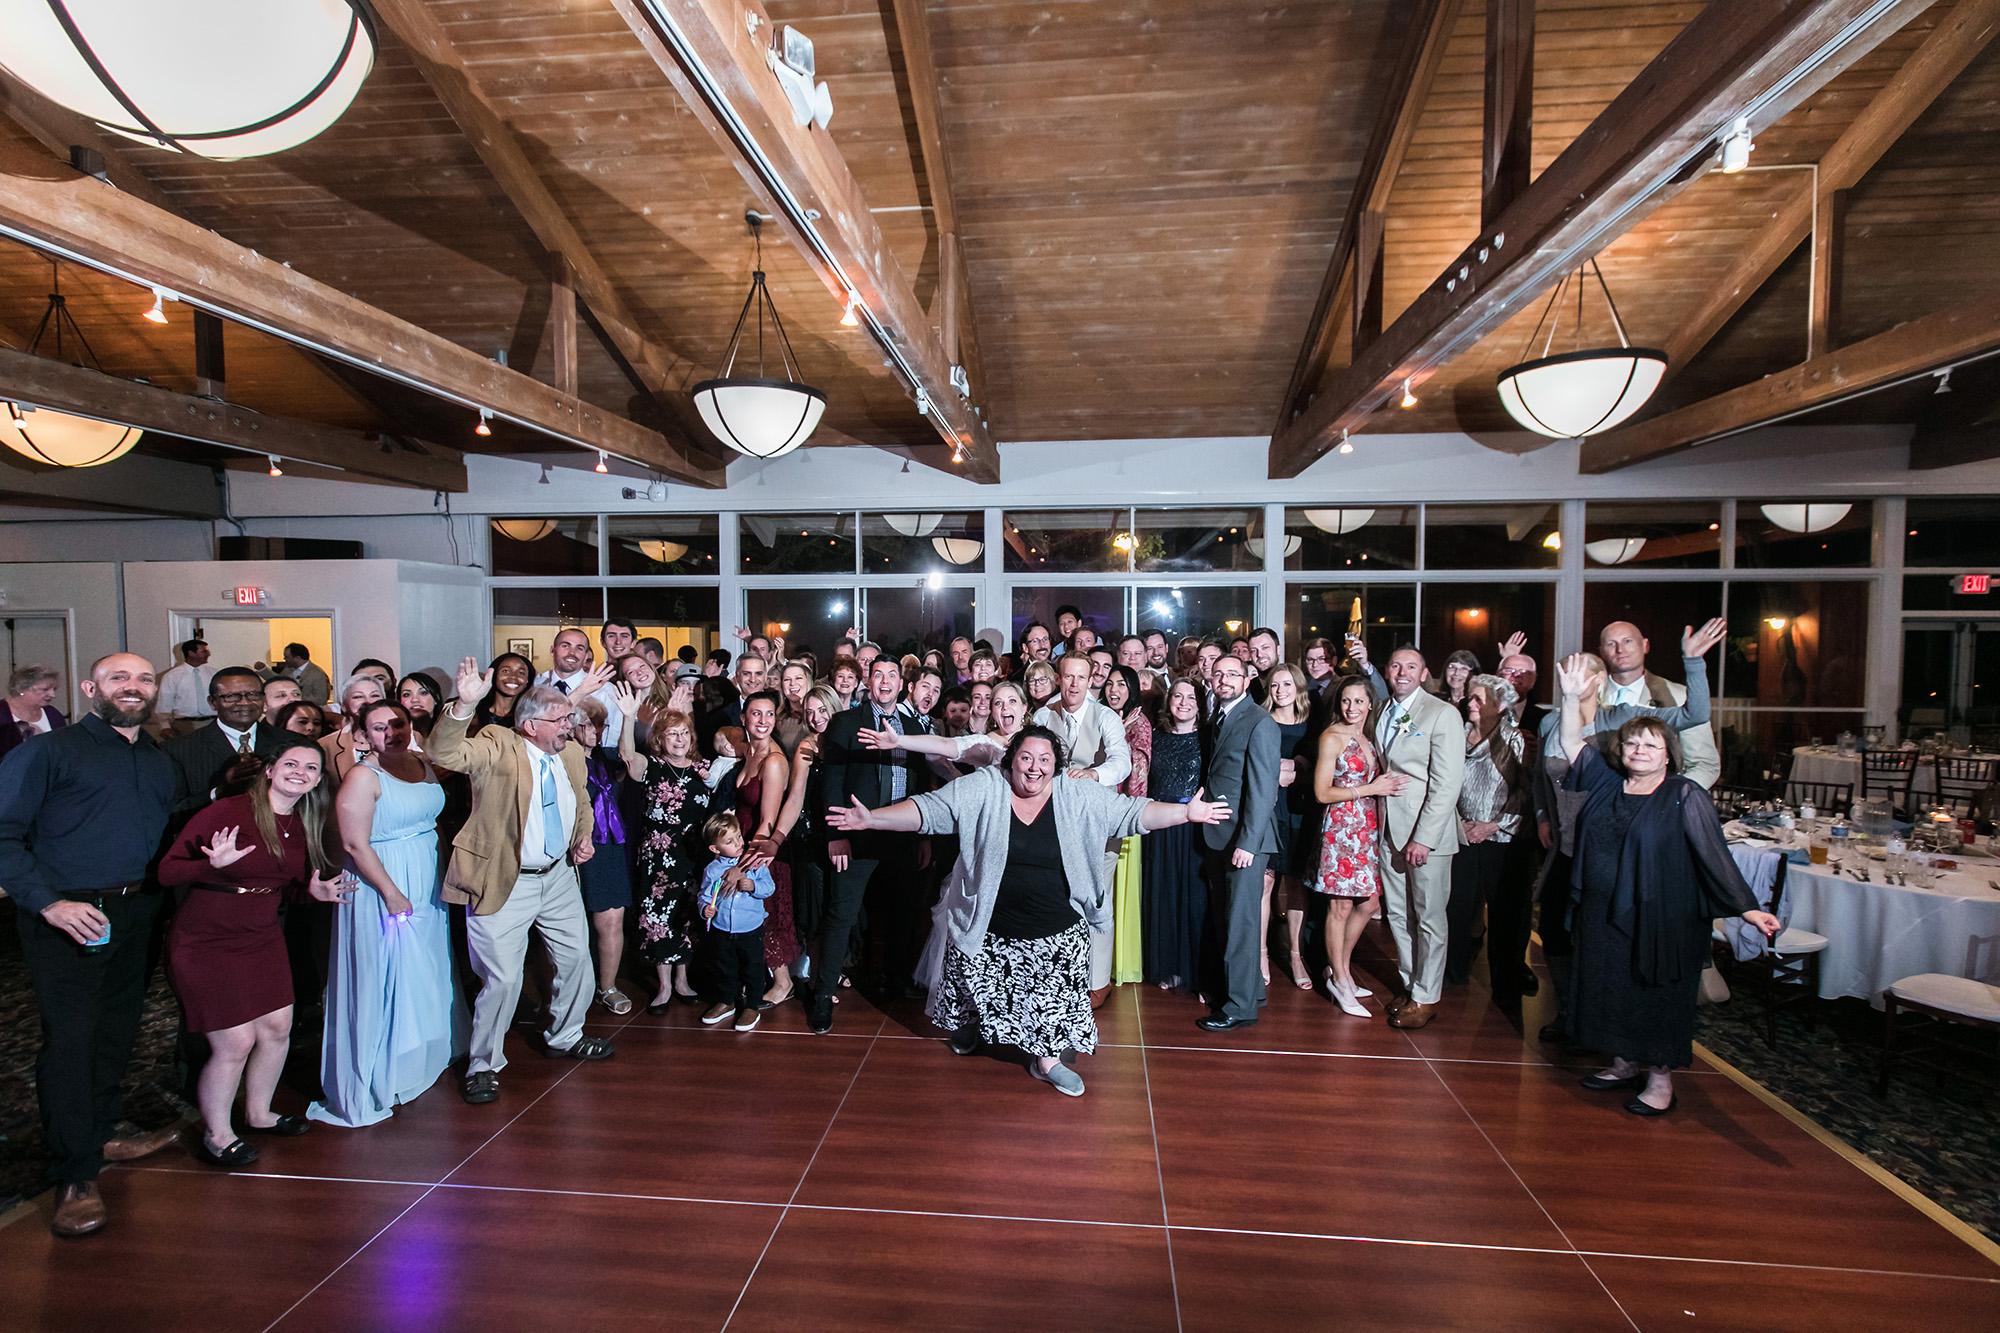 unforgettable-st-monica-wedding-carrie-vines-photography-126.jpg